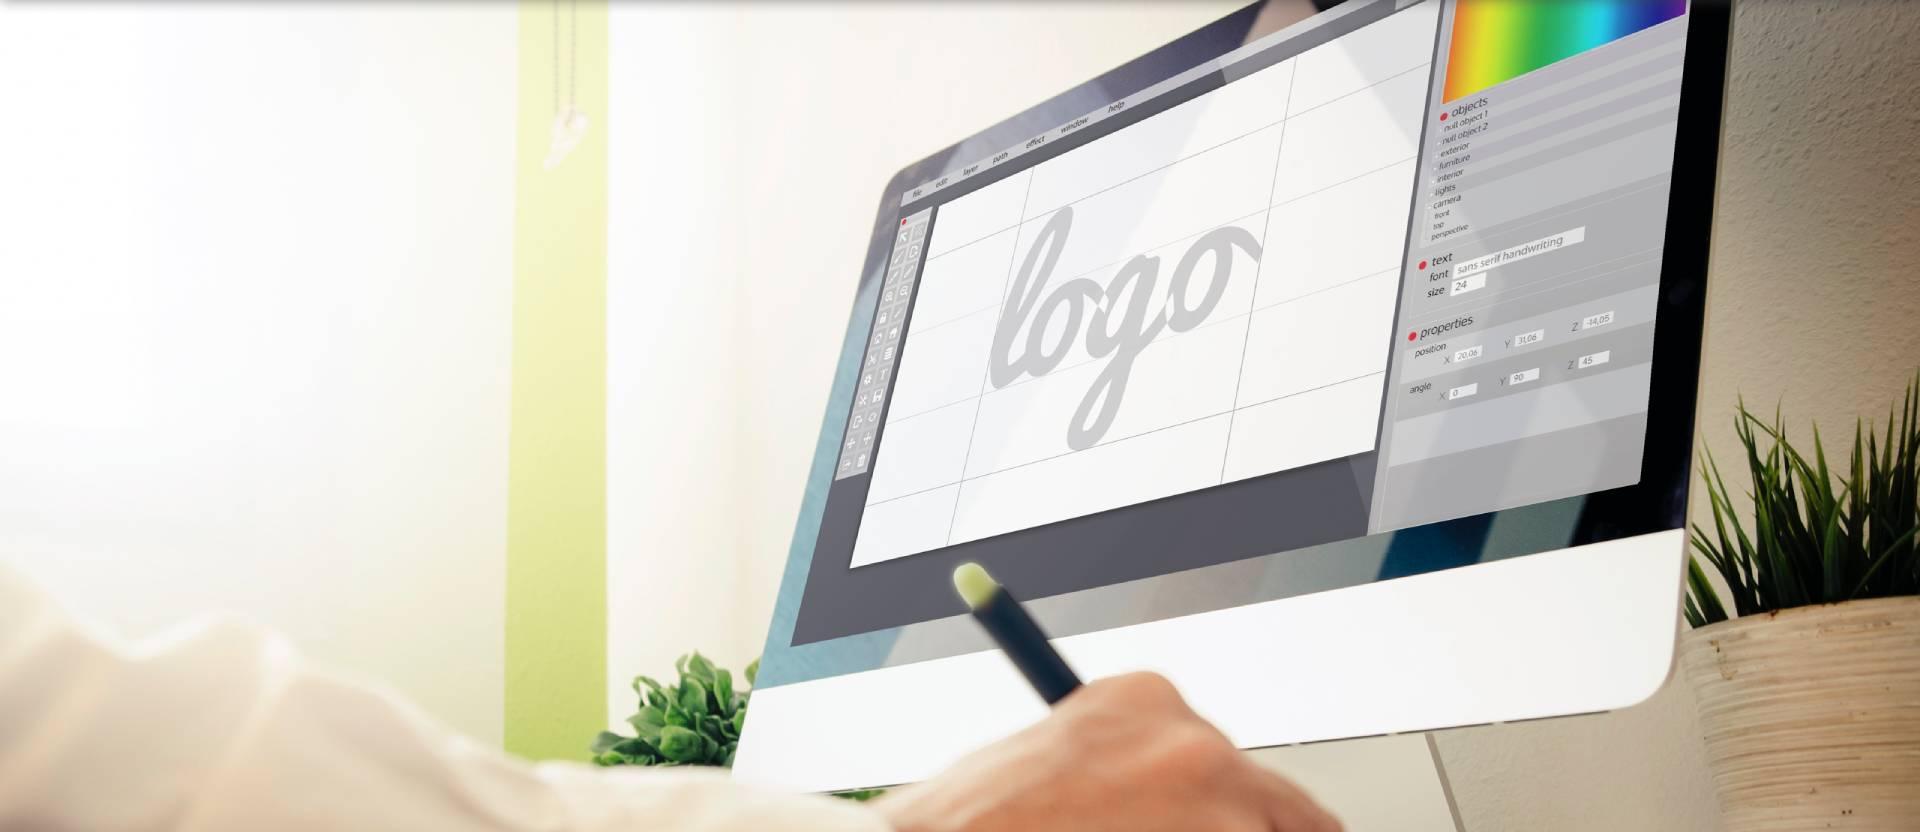 logos-brand-assets